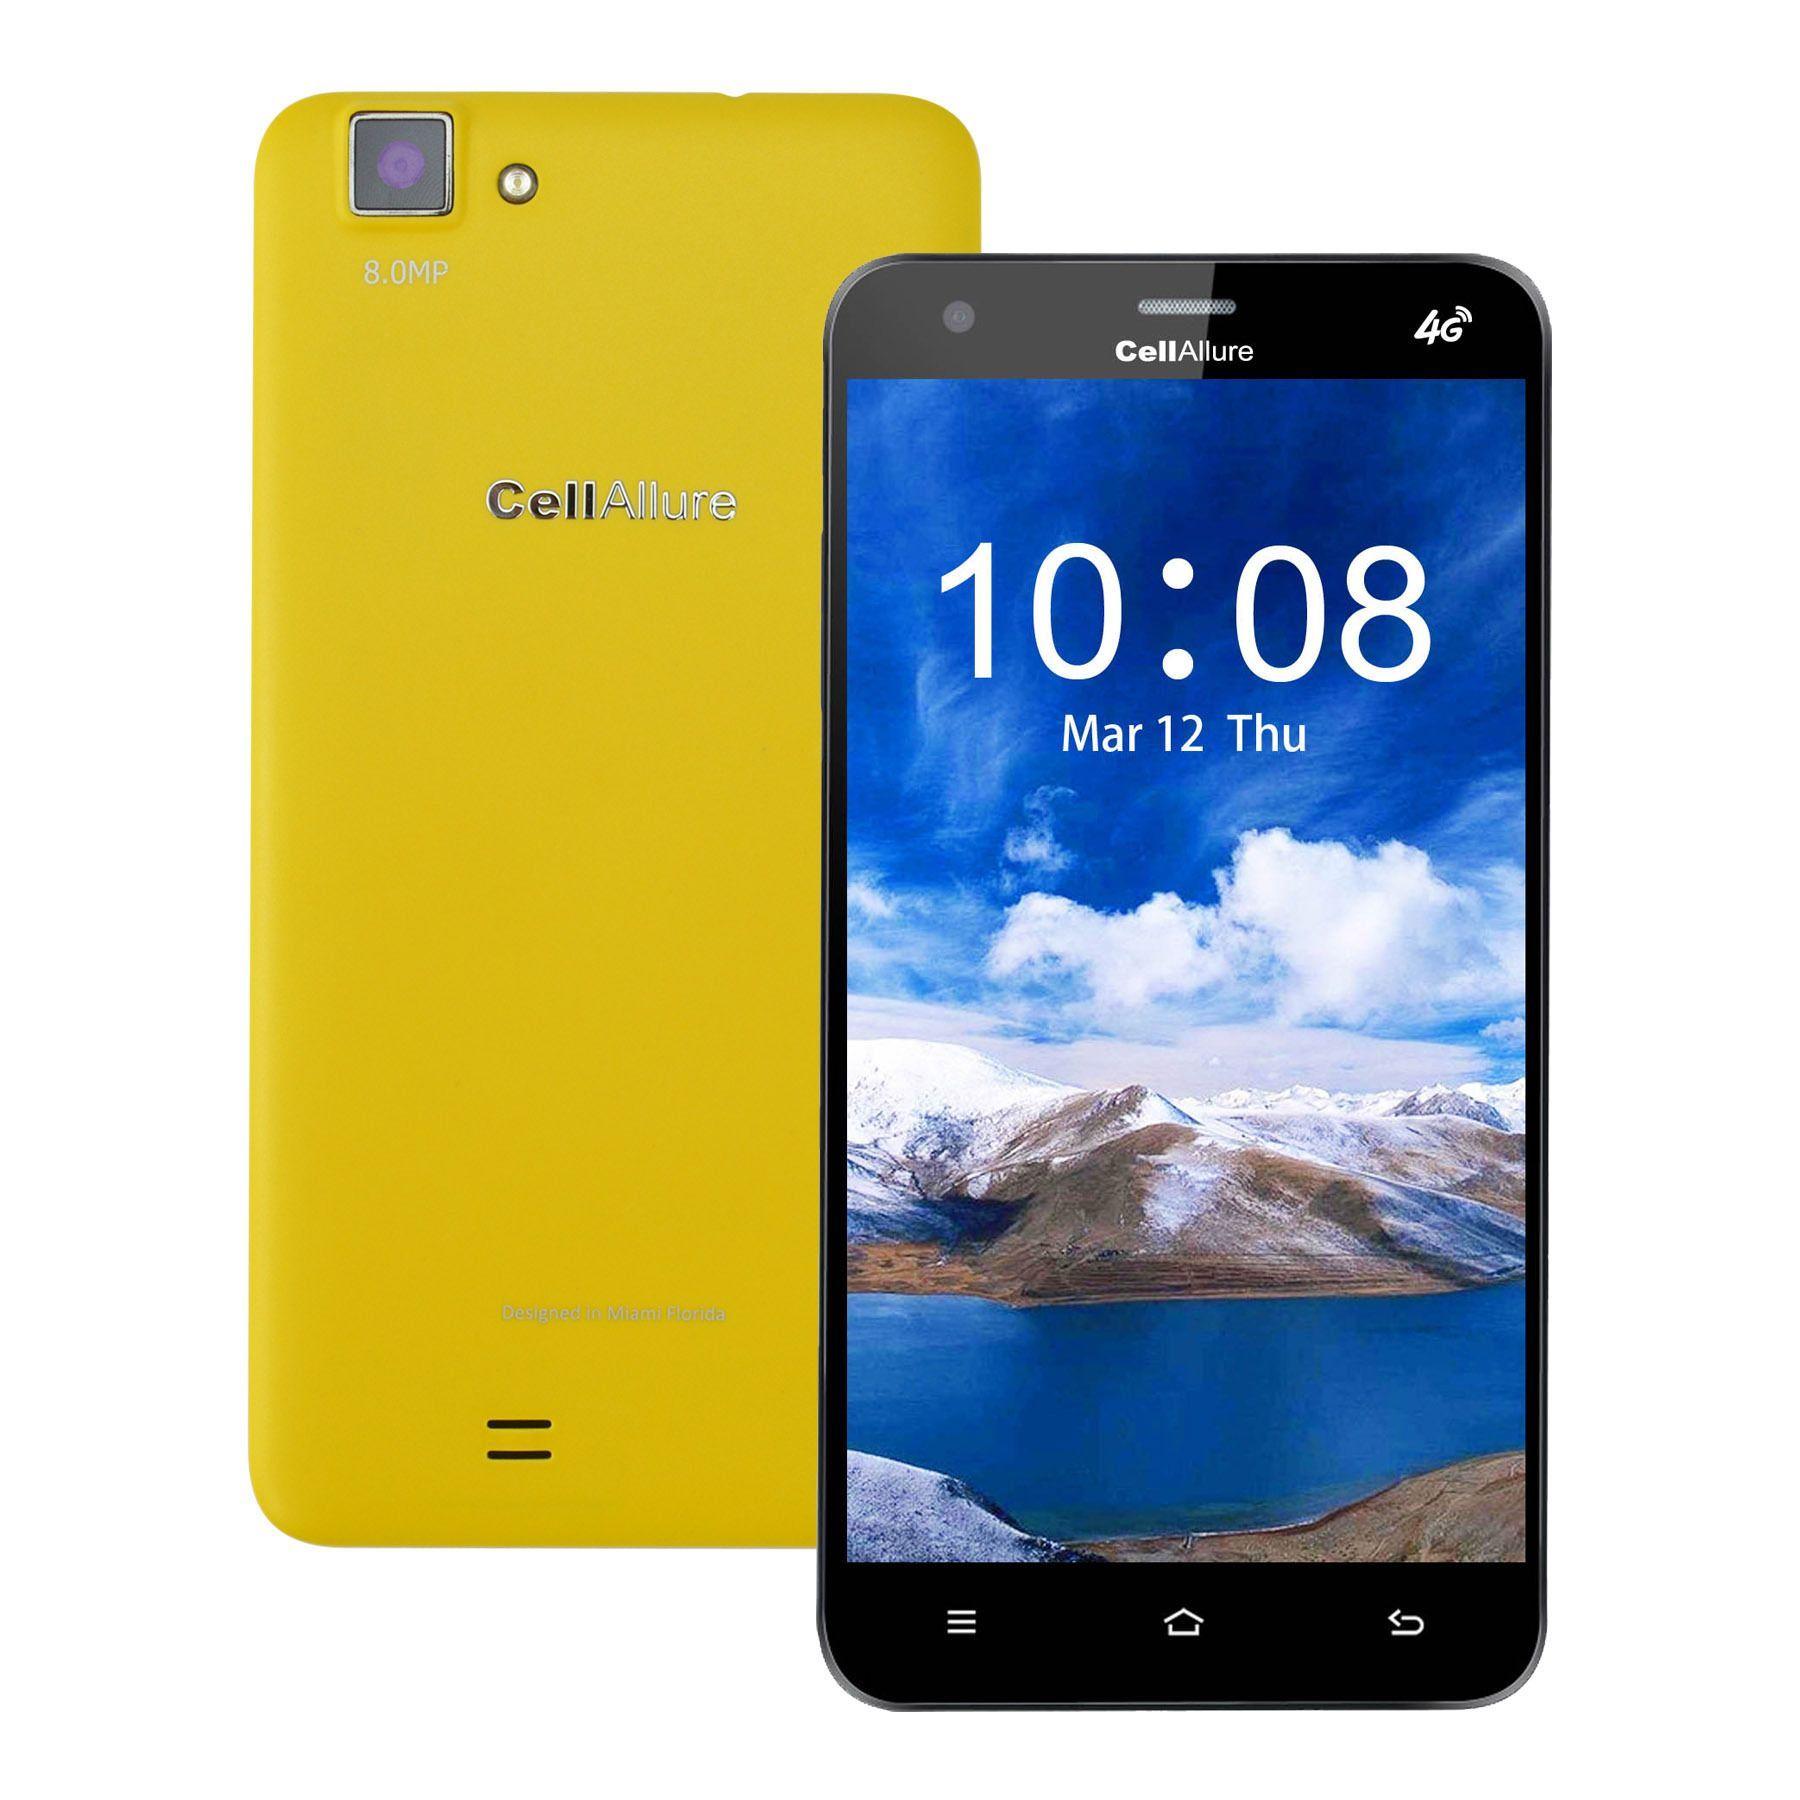 CellAllure Cool 5.5 OGS/ Dual SIM/ 4G HPSD+/ 5.5inch